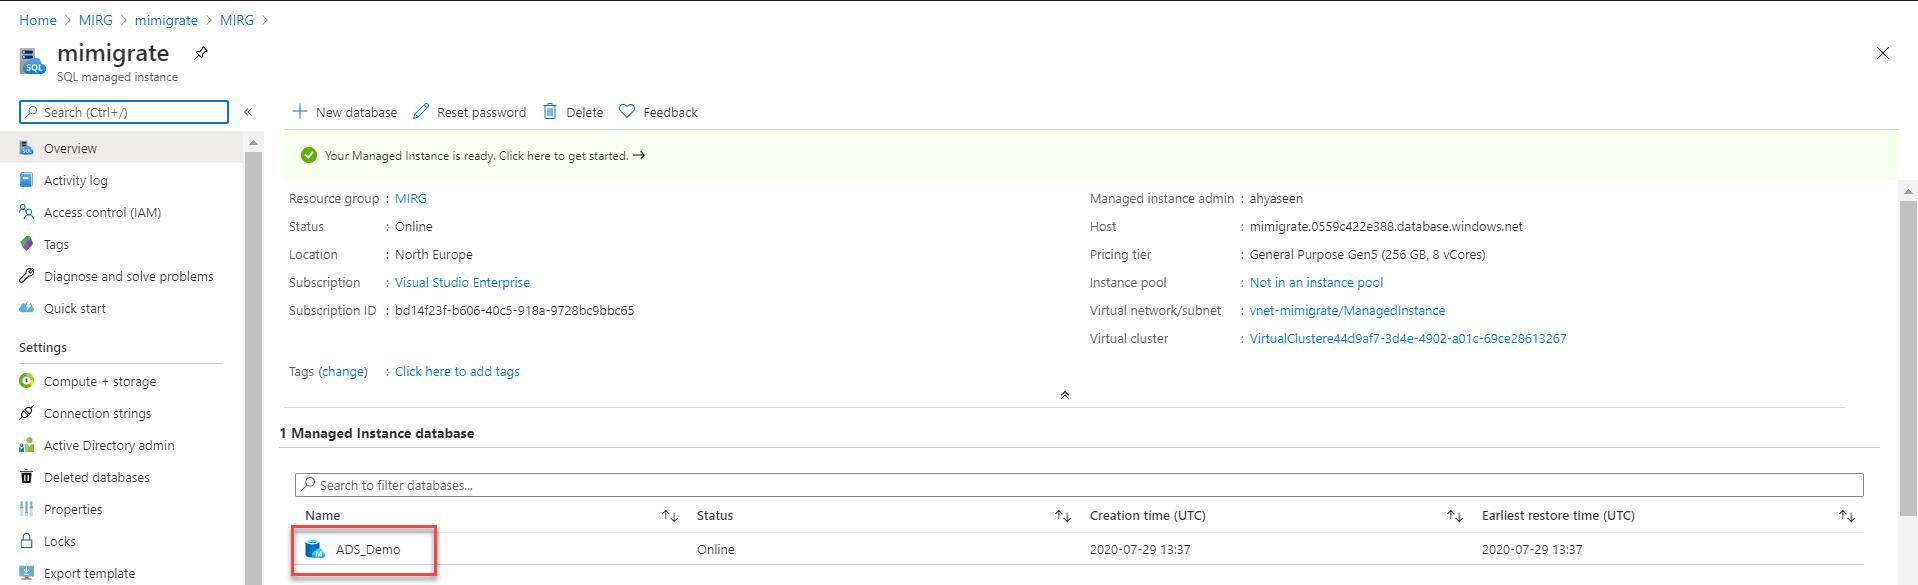 Managed Instance databases